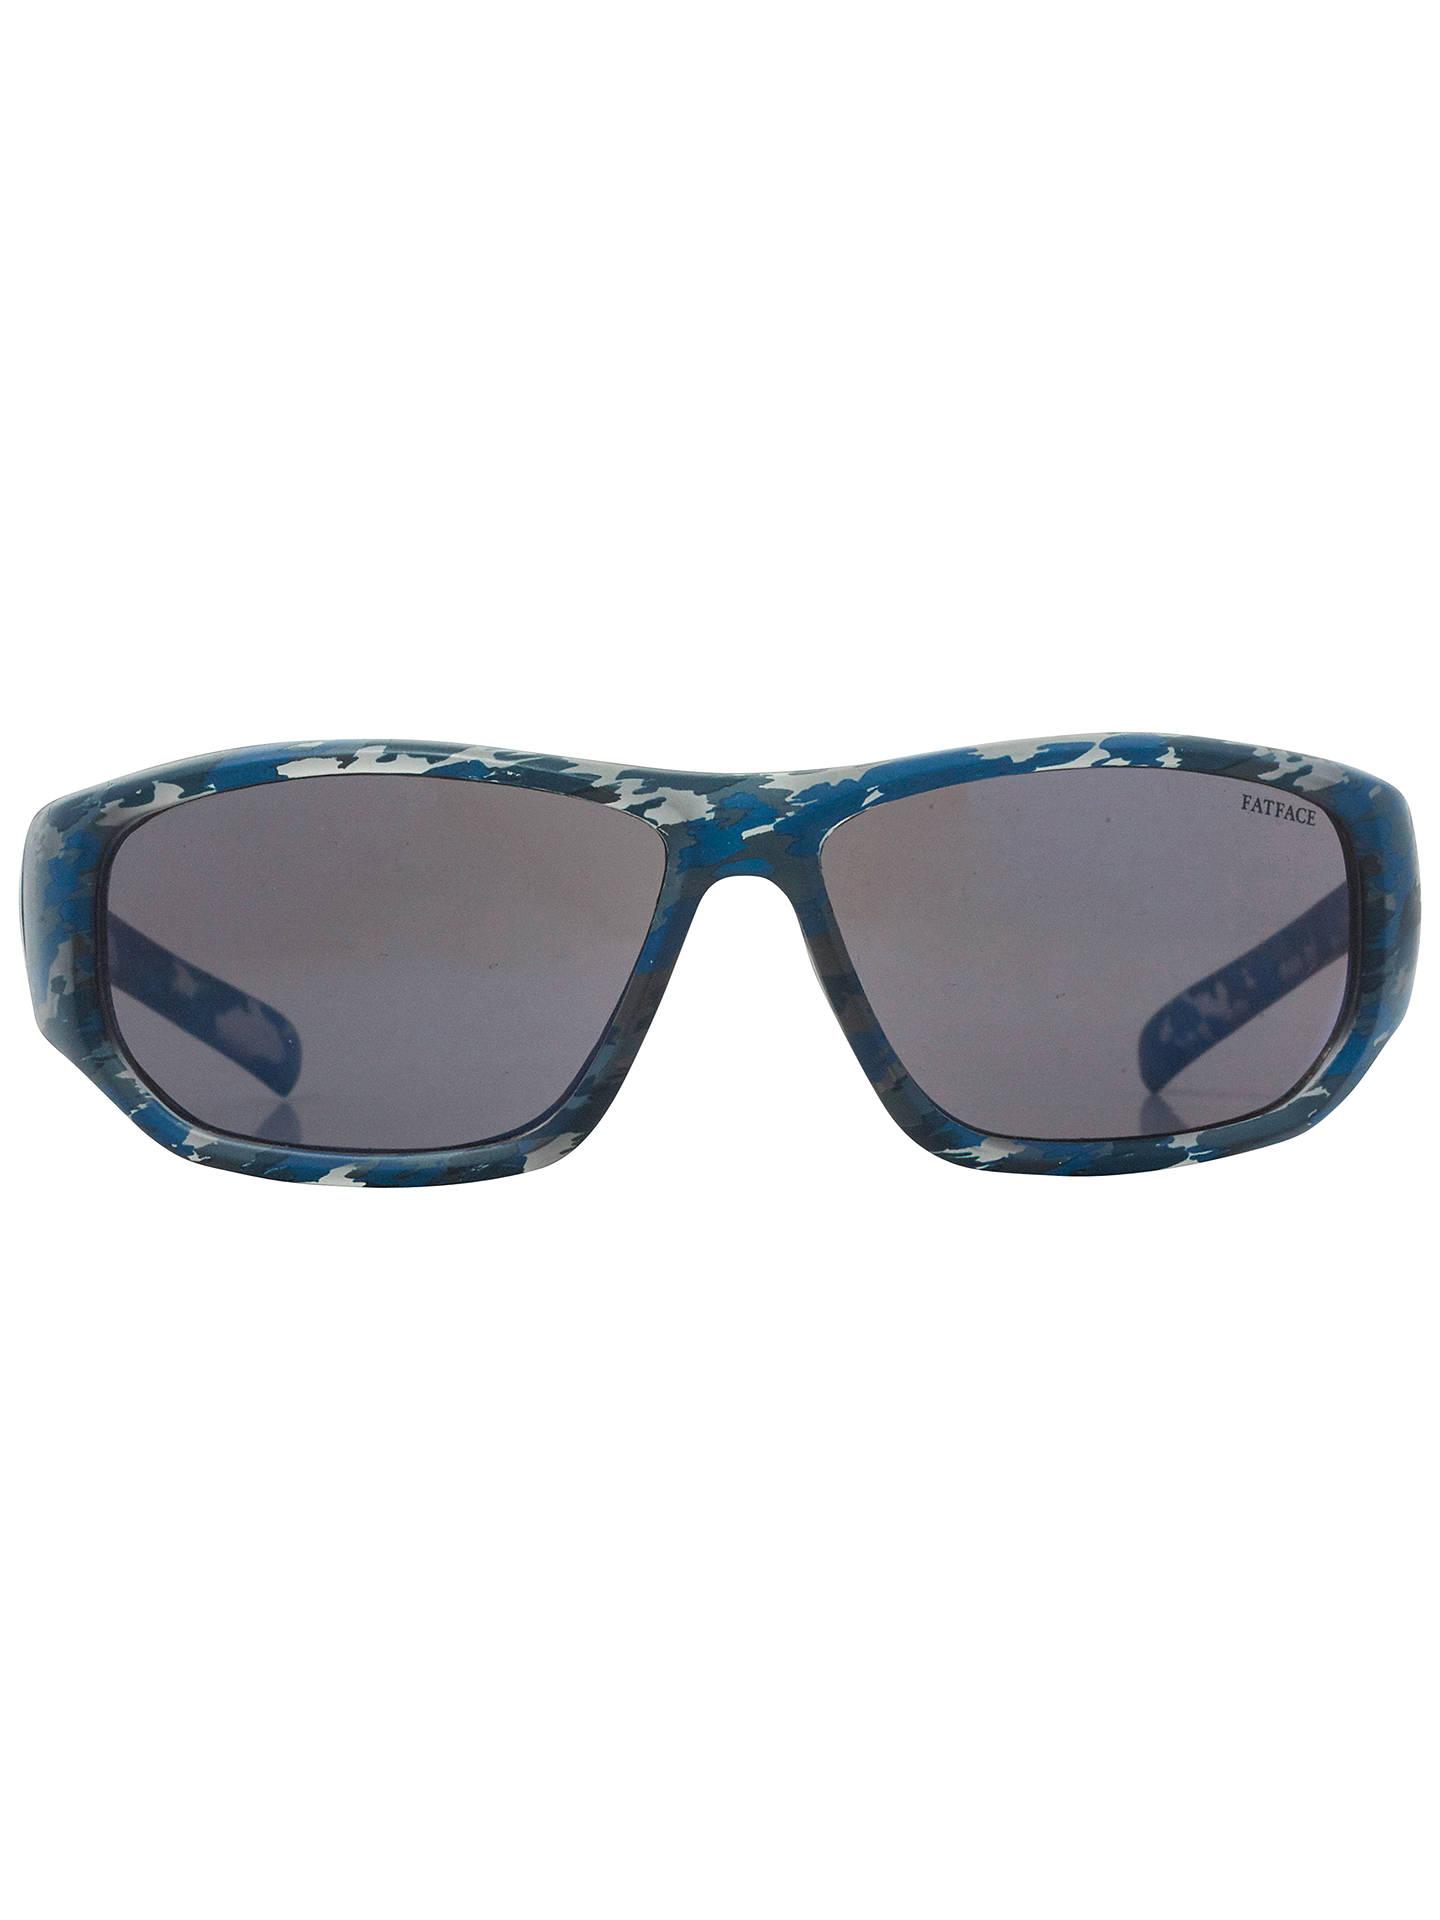 09111daa45 Buy Fat Face Children s Camo Wrap Sunglasses